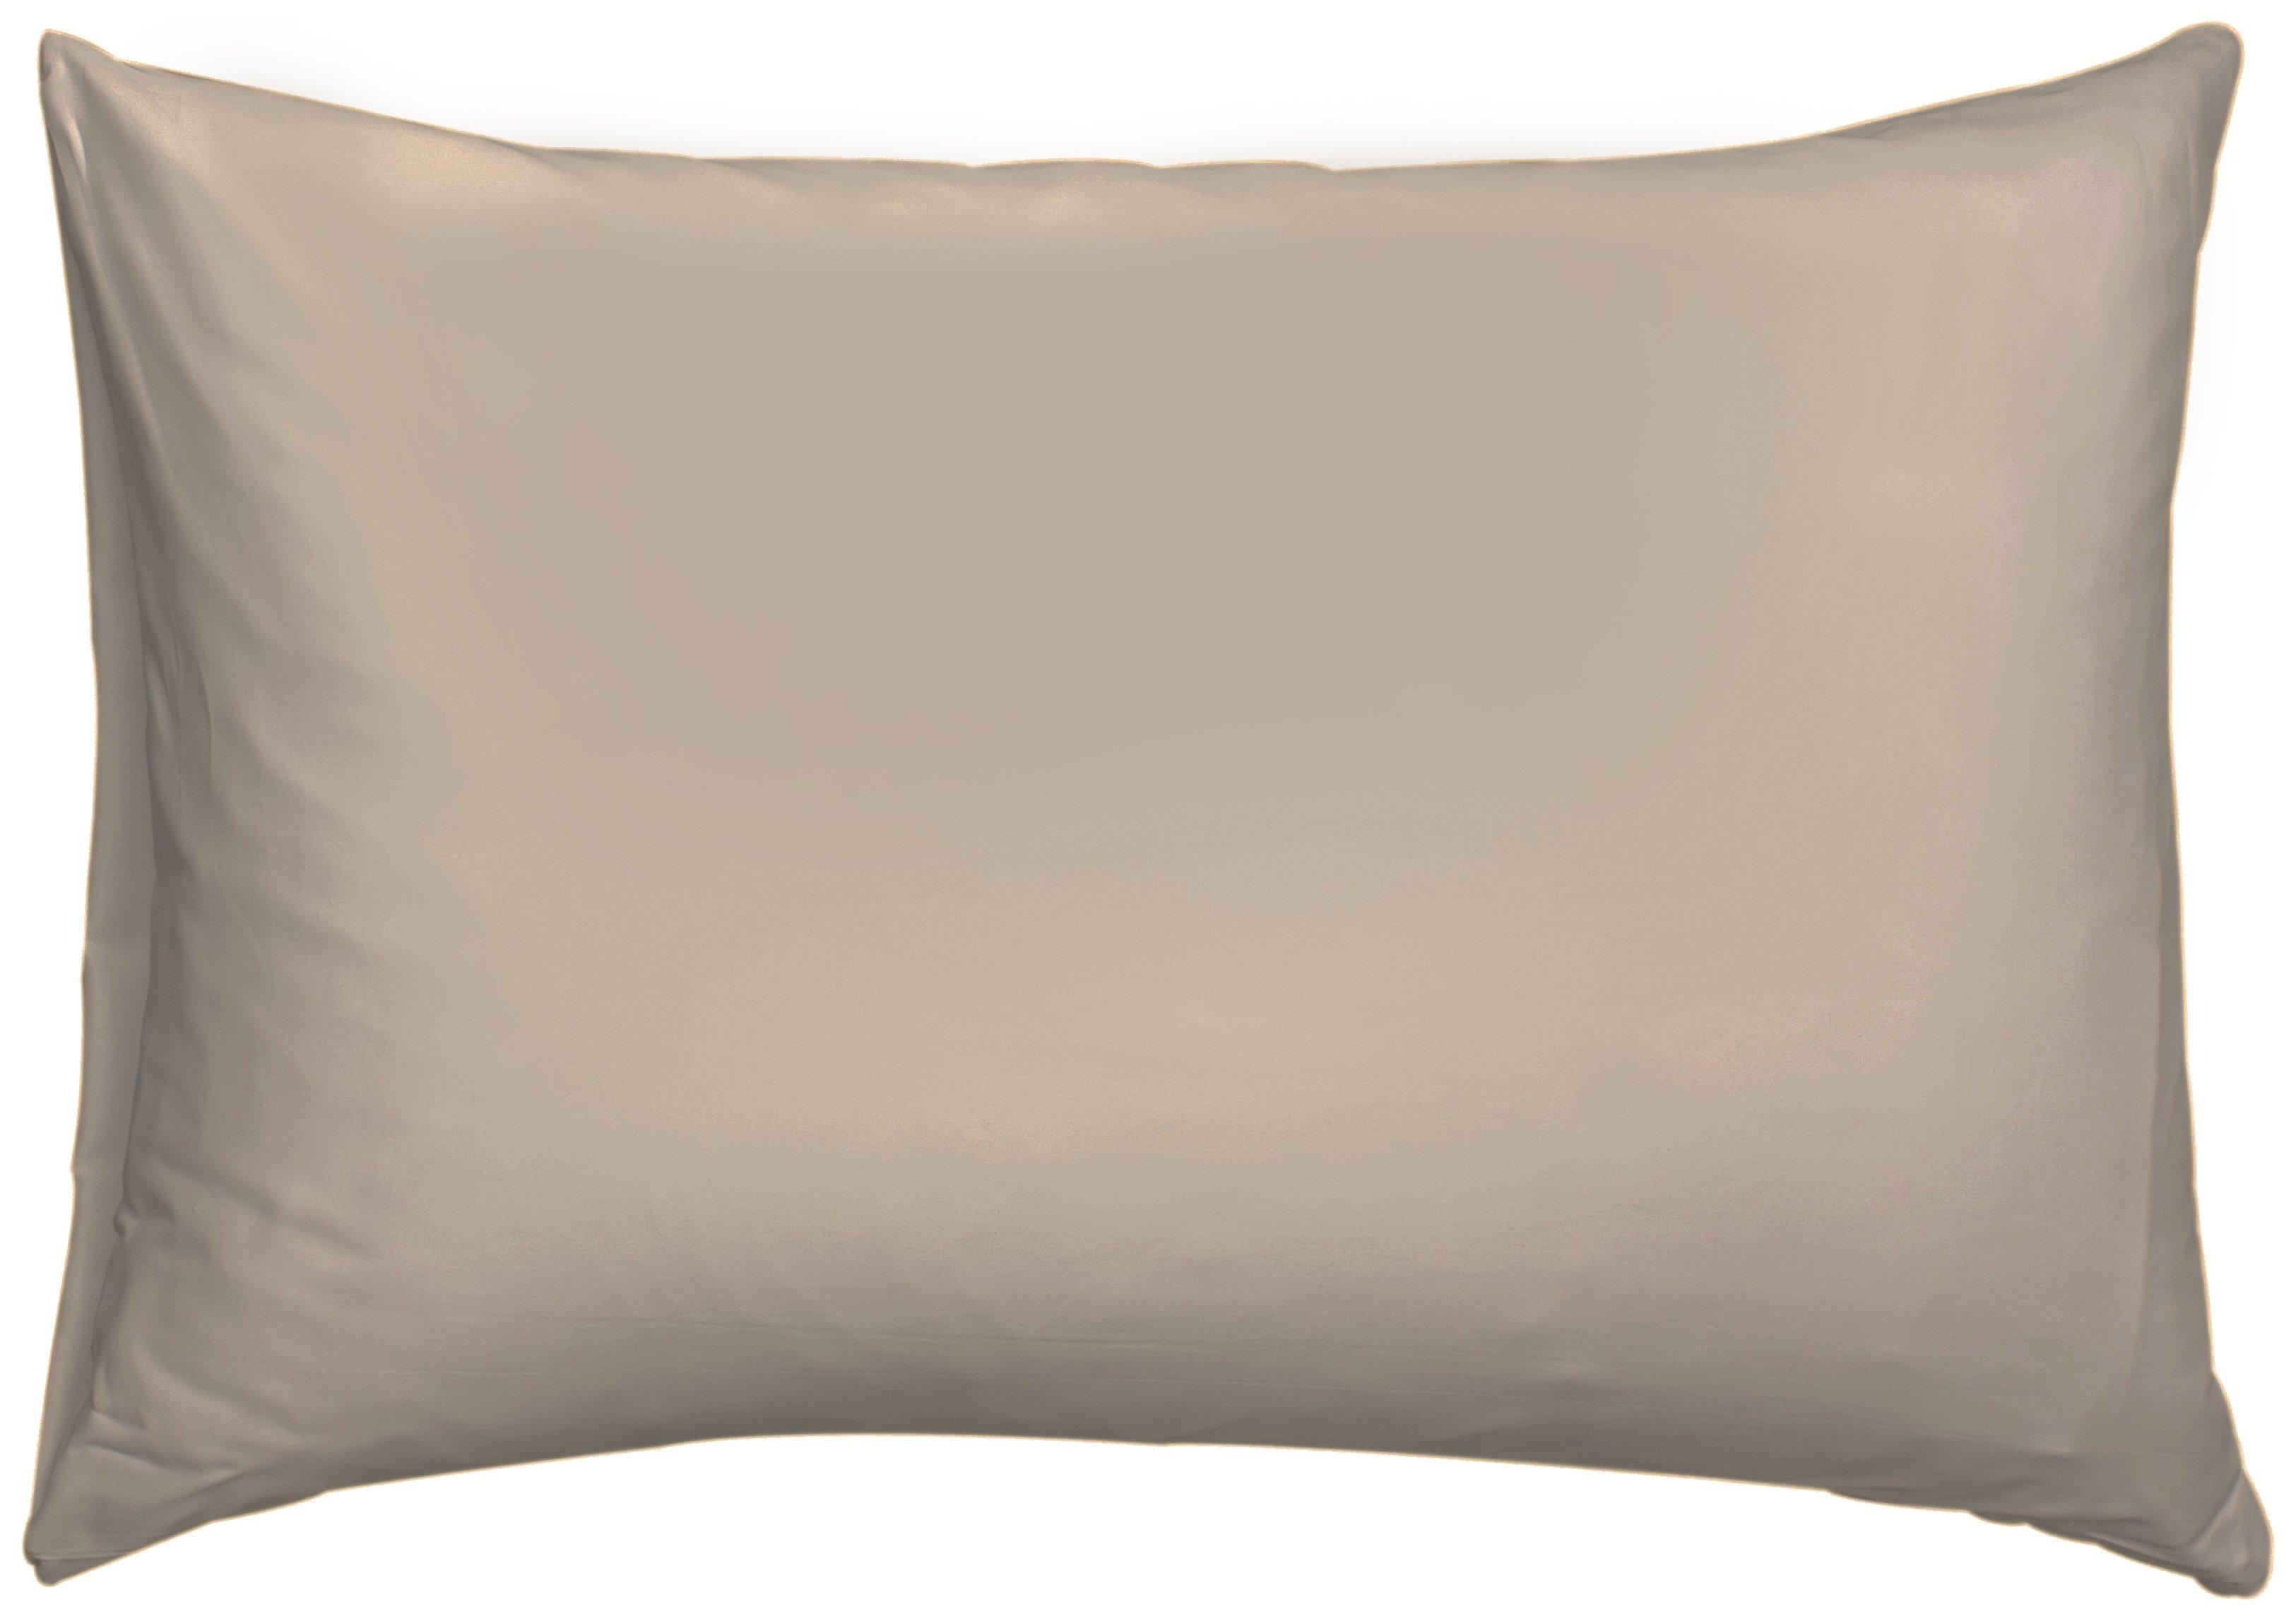 downland  latte kingsize pillowcases  set of 2